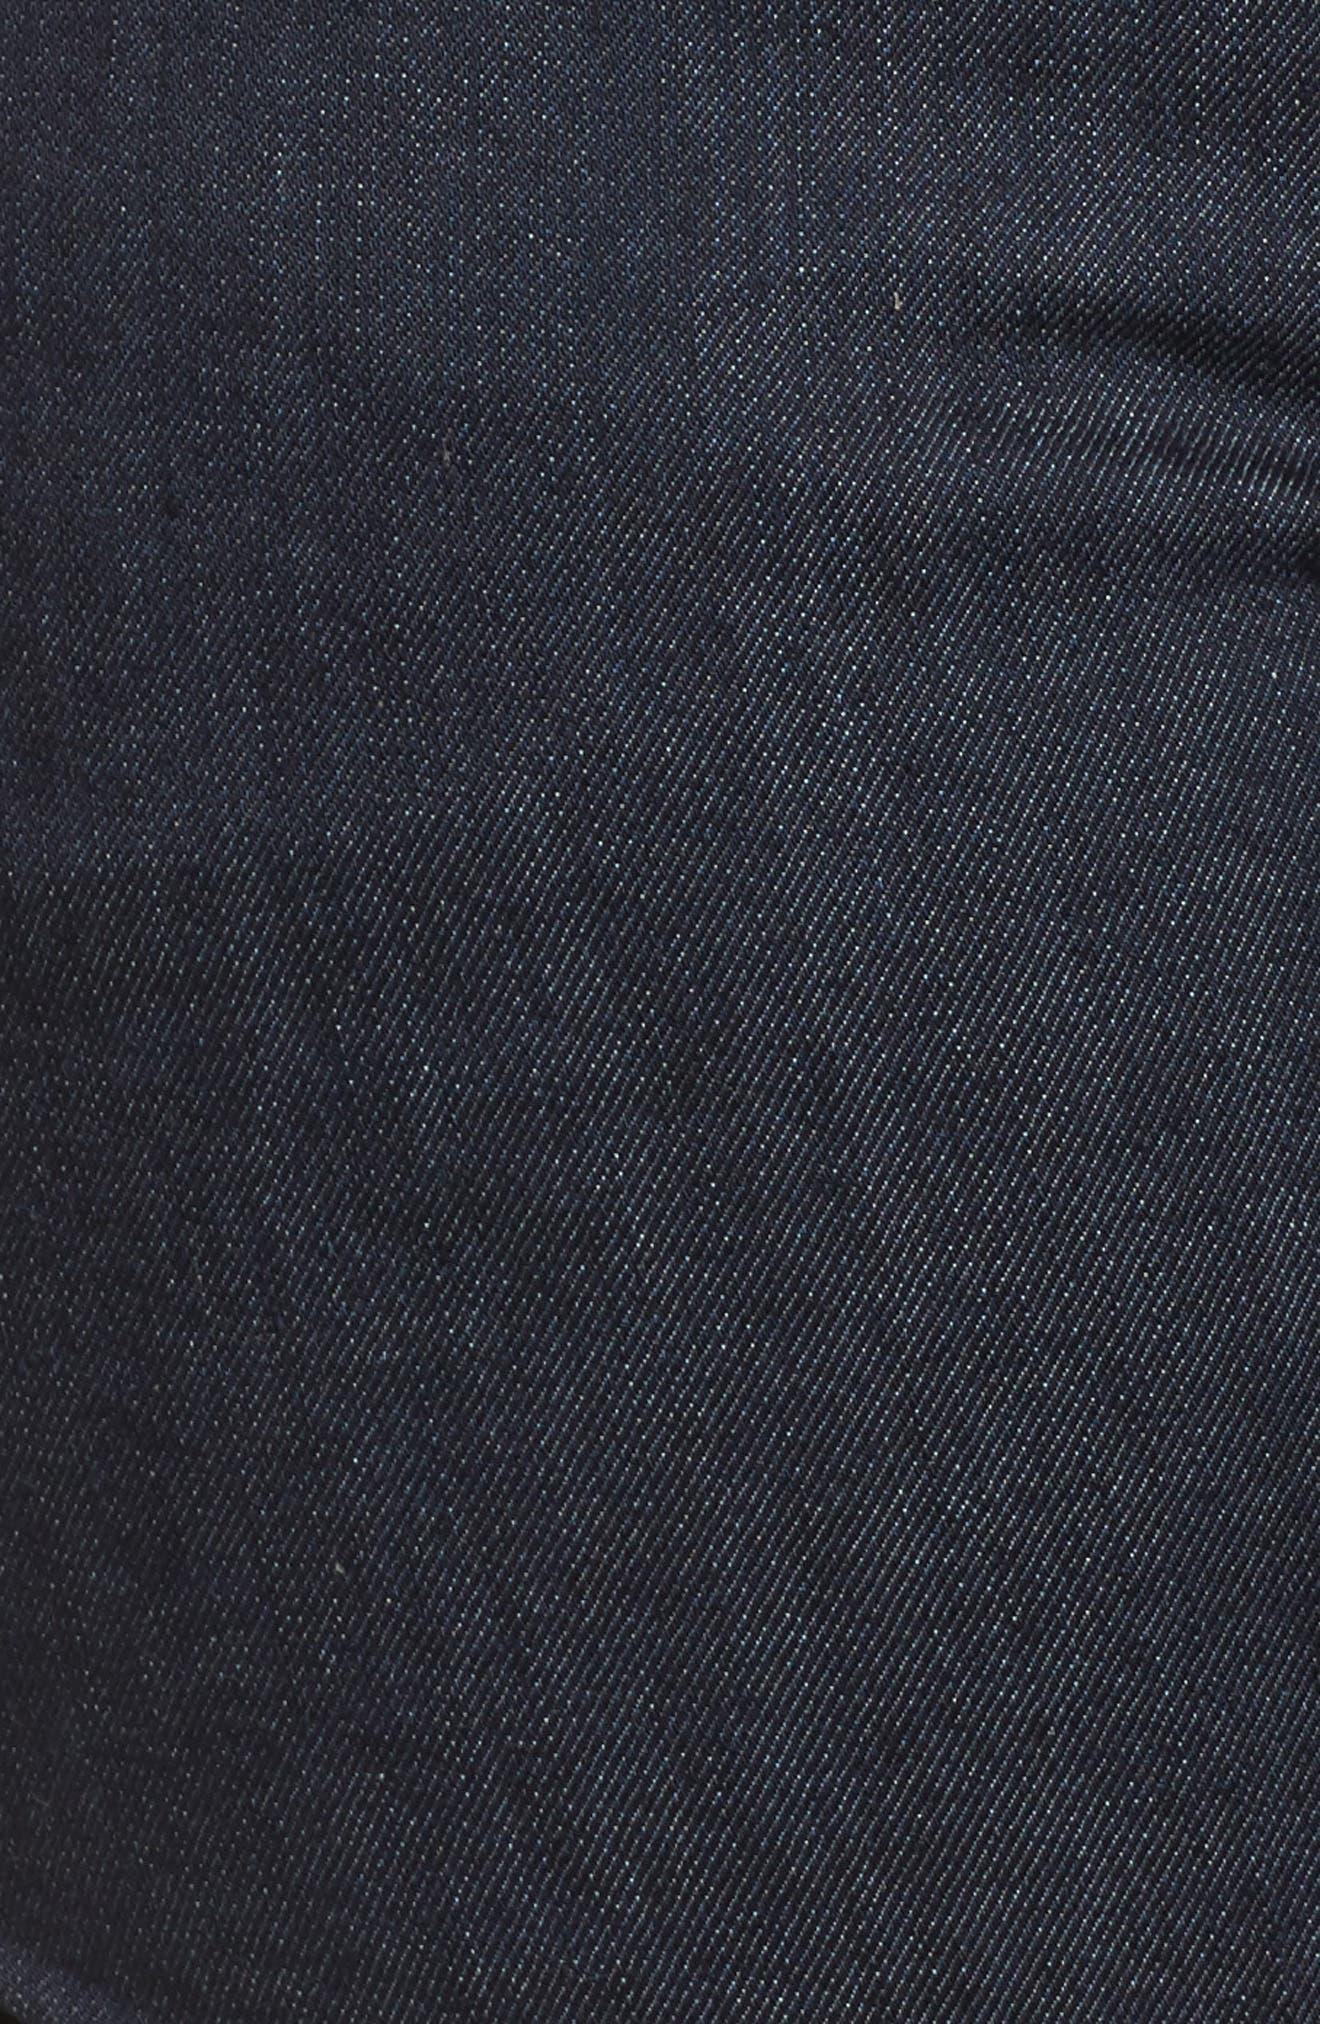 Side Vent Shorts,                             Alternate thumbnail 6, color,